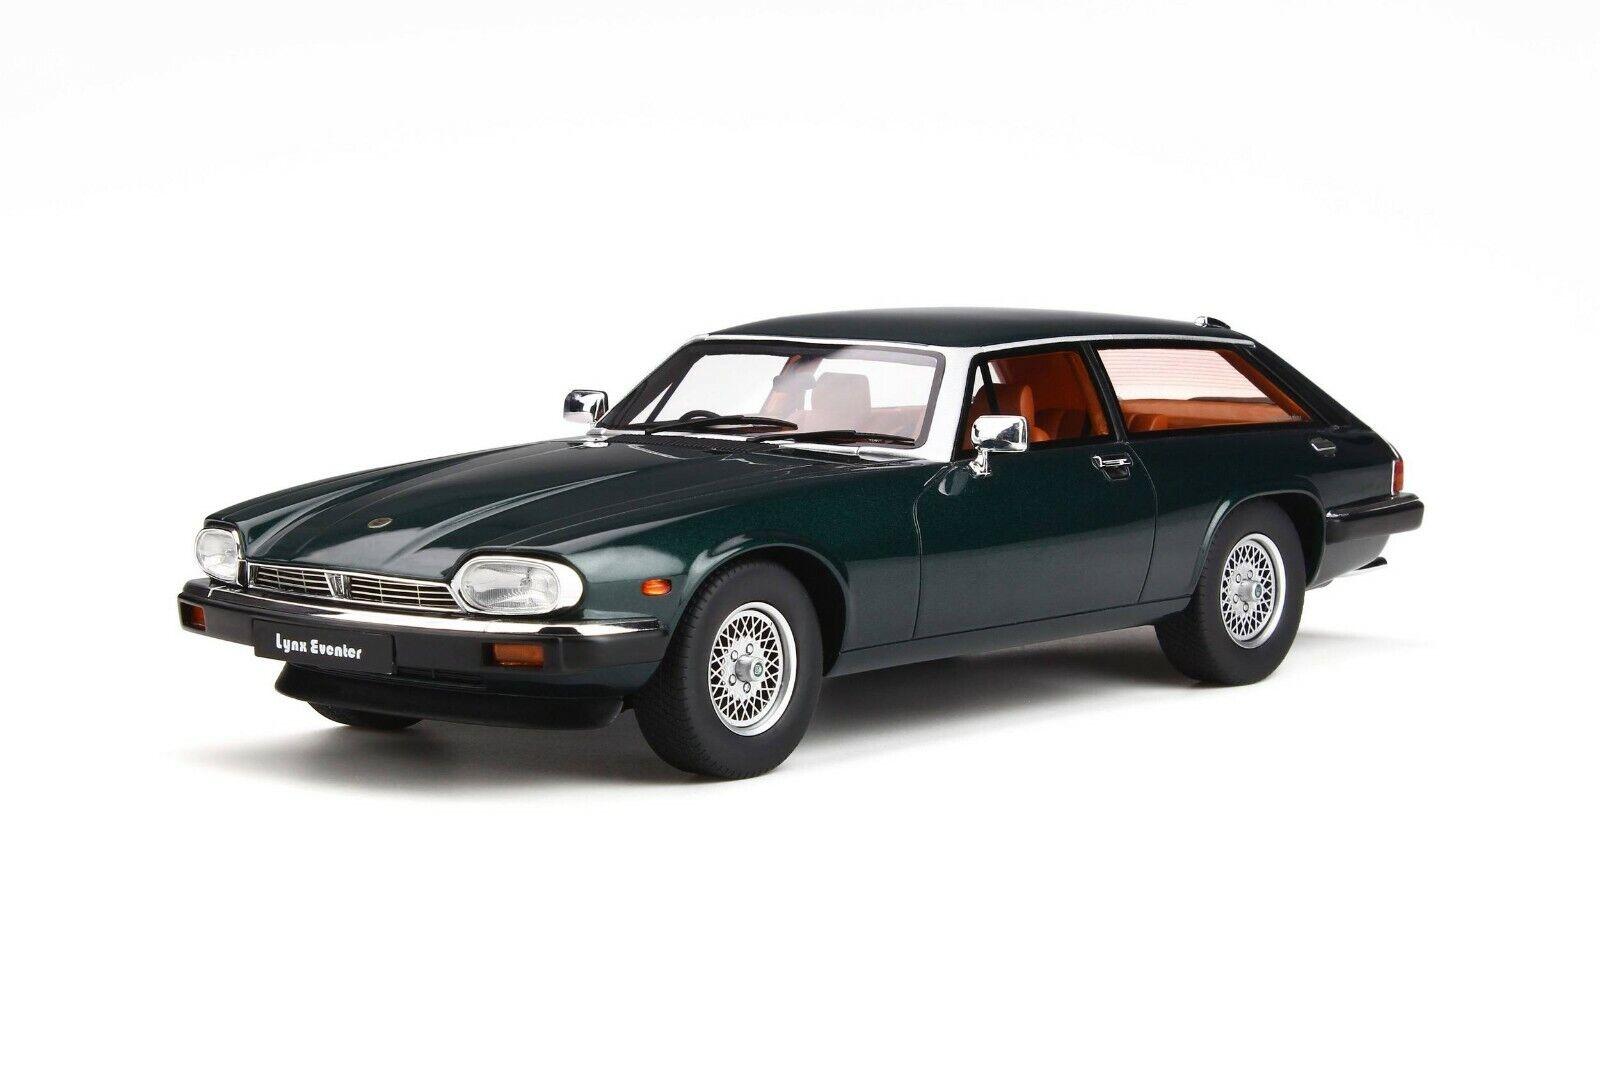 GT Spirit GTS 216  1  18 Jaguar xjs eveenter, British Kart verde... New ¡GT Spirit GTS 216  1  18 Jaguar xjs eveenter, British Kart verde... New